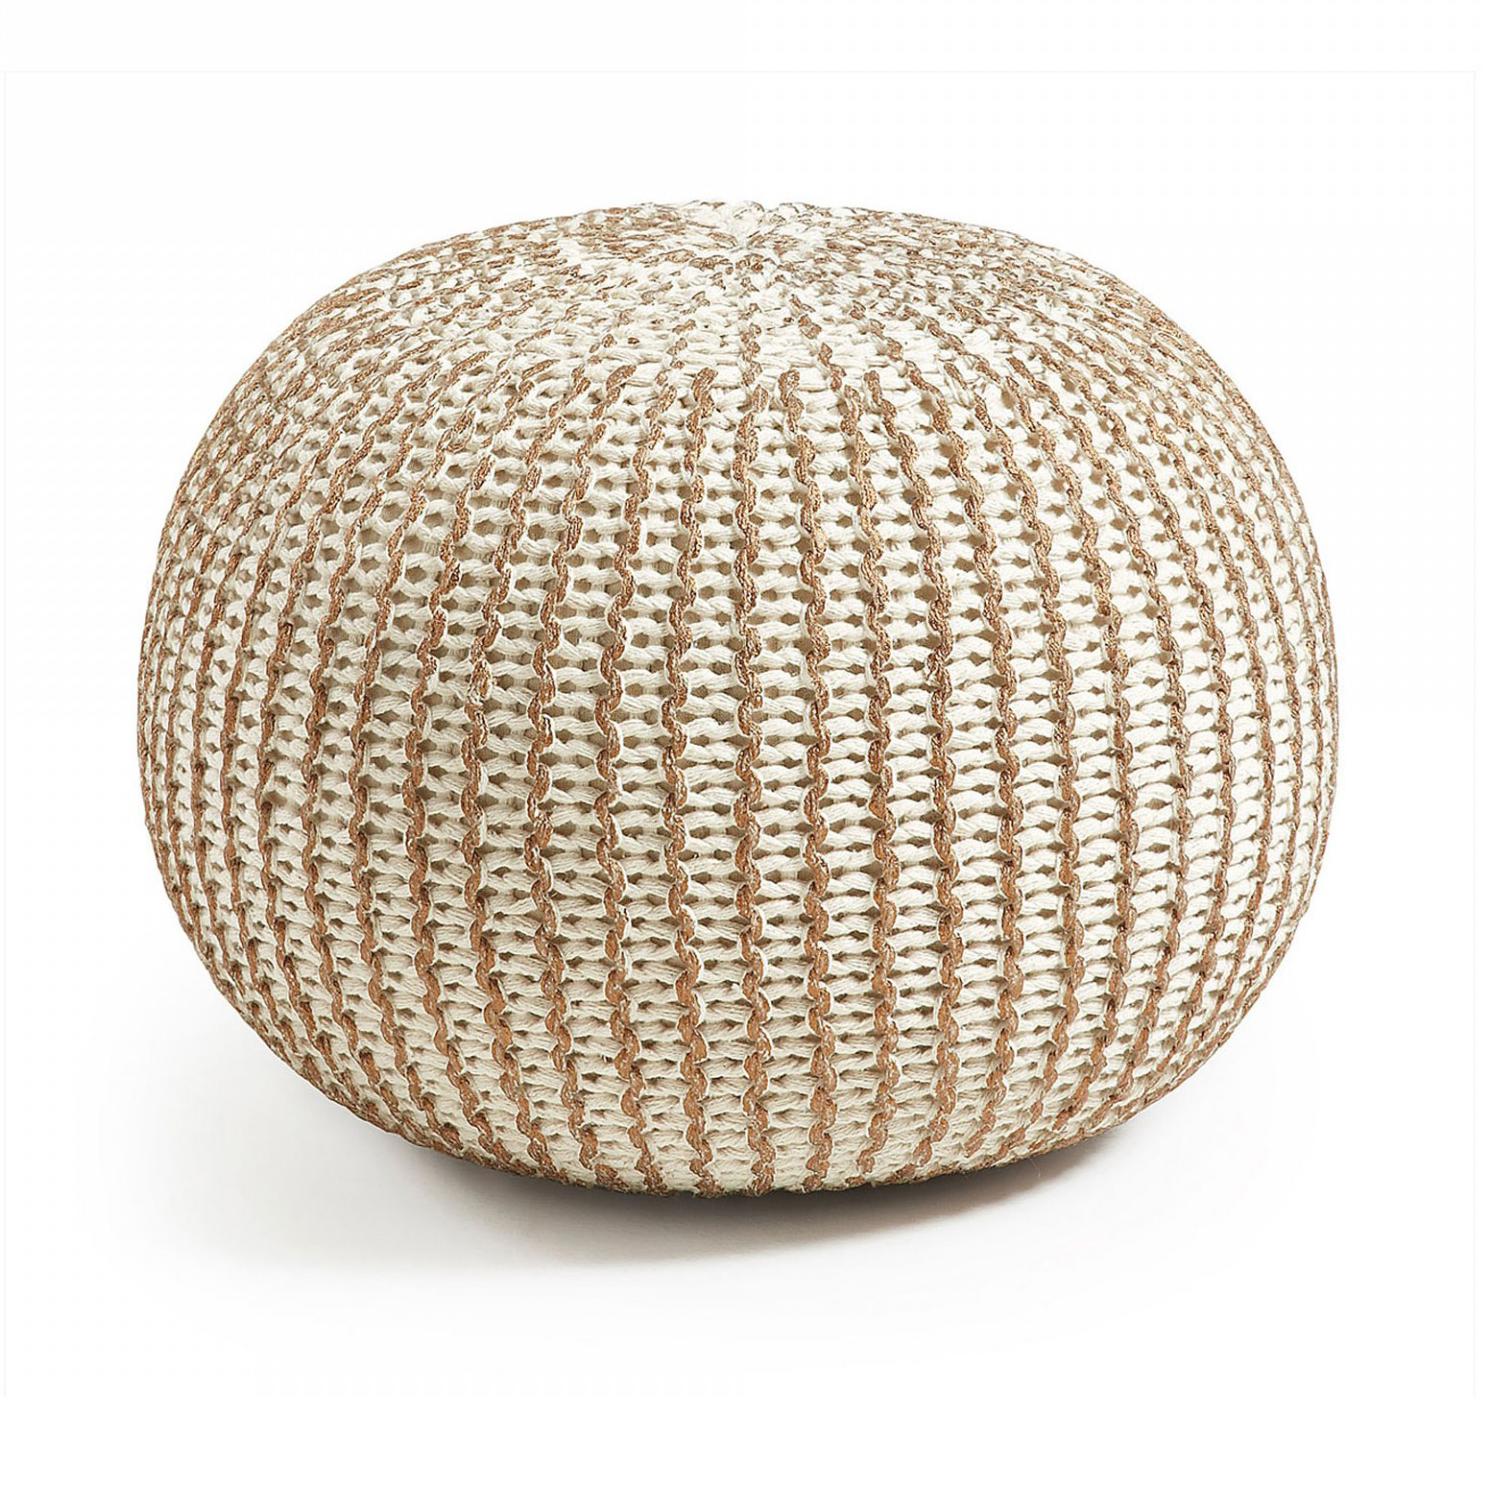 Pufe Suke, malha de croché, branco/dourado, Ø45x35